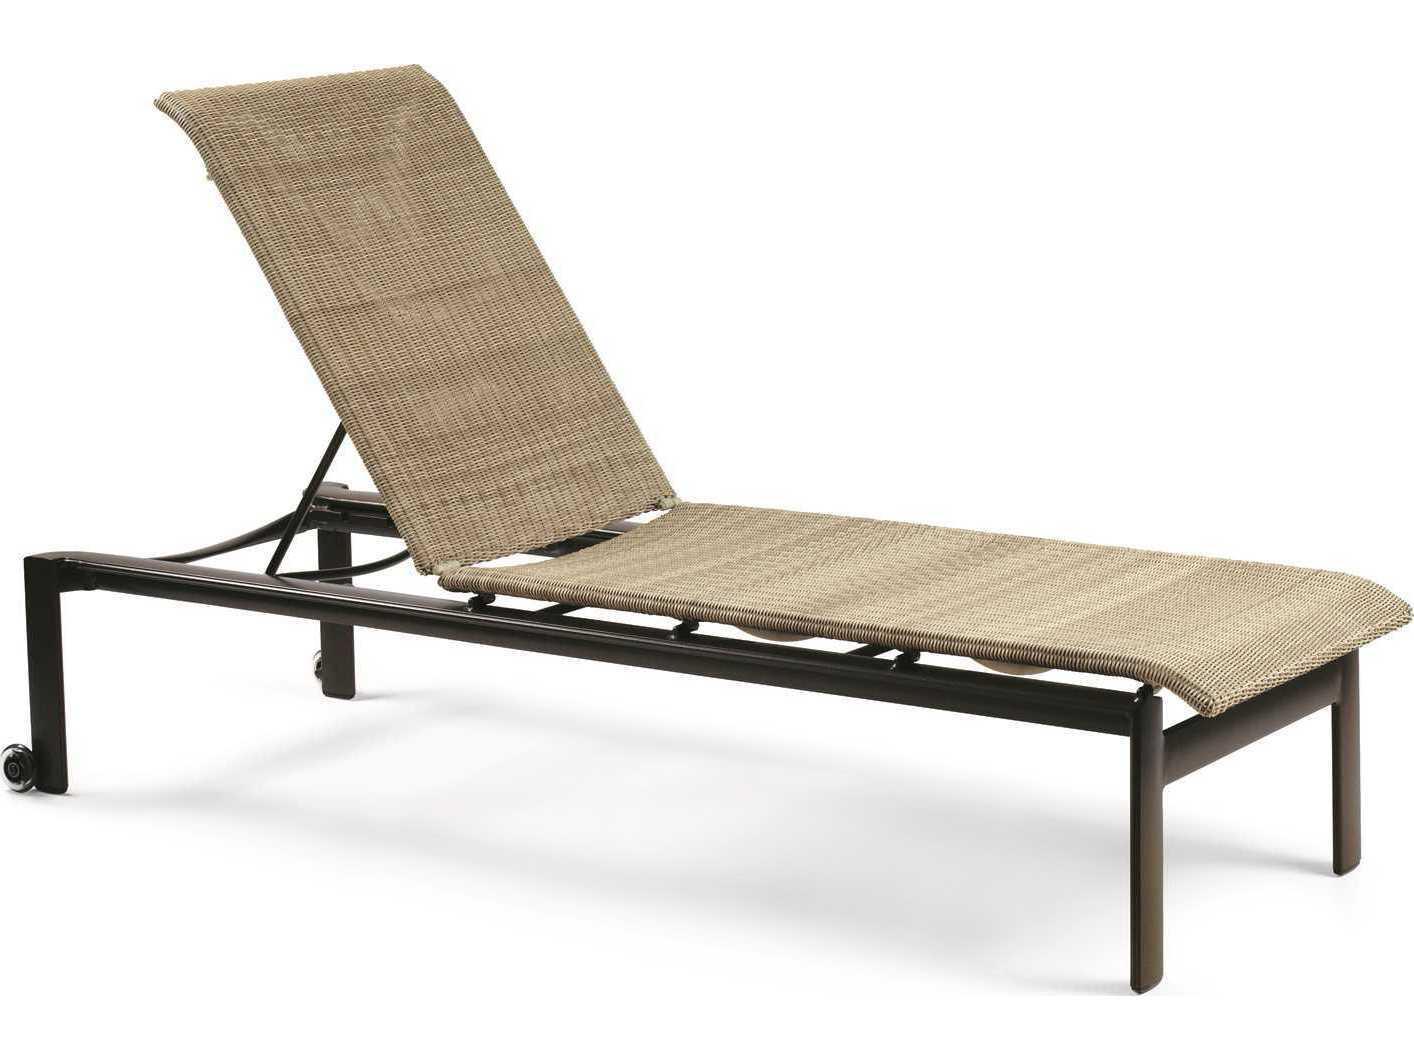 Winston belvedere woven aluminum stackable chaise lounge for Chaise longue textilene alu